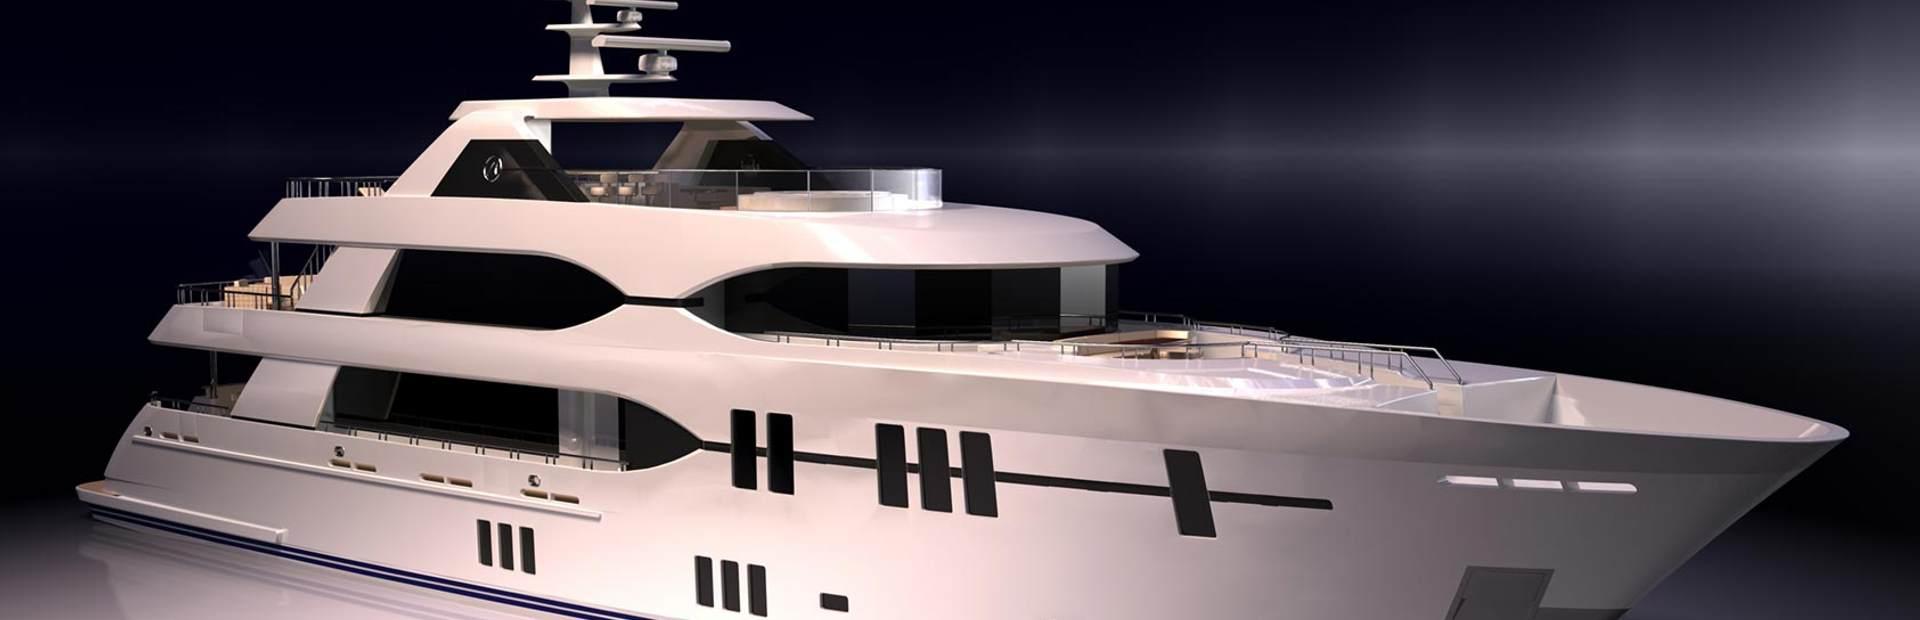 135 Megayacht Yacht Charter